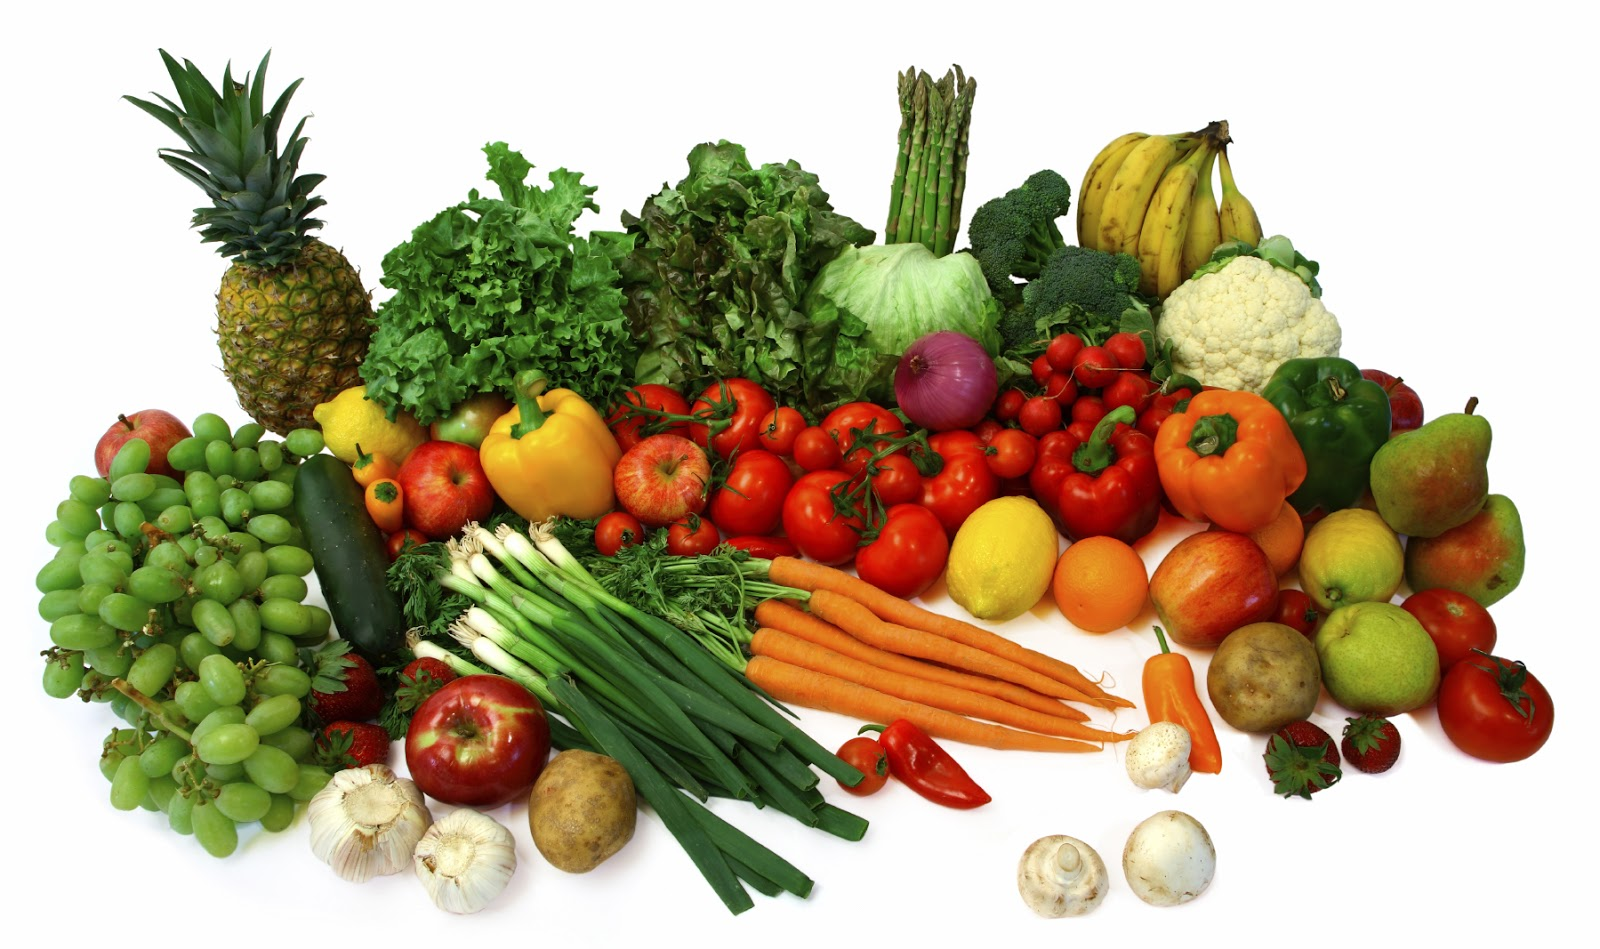 KHETI BARI: Indian vegetable production at 156 million in 2011-12